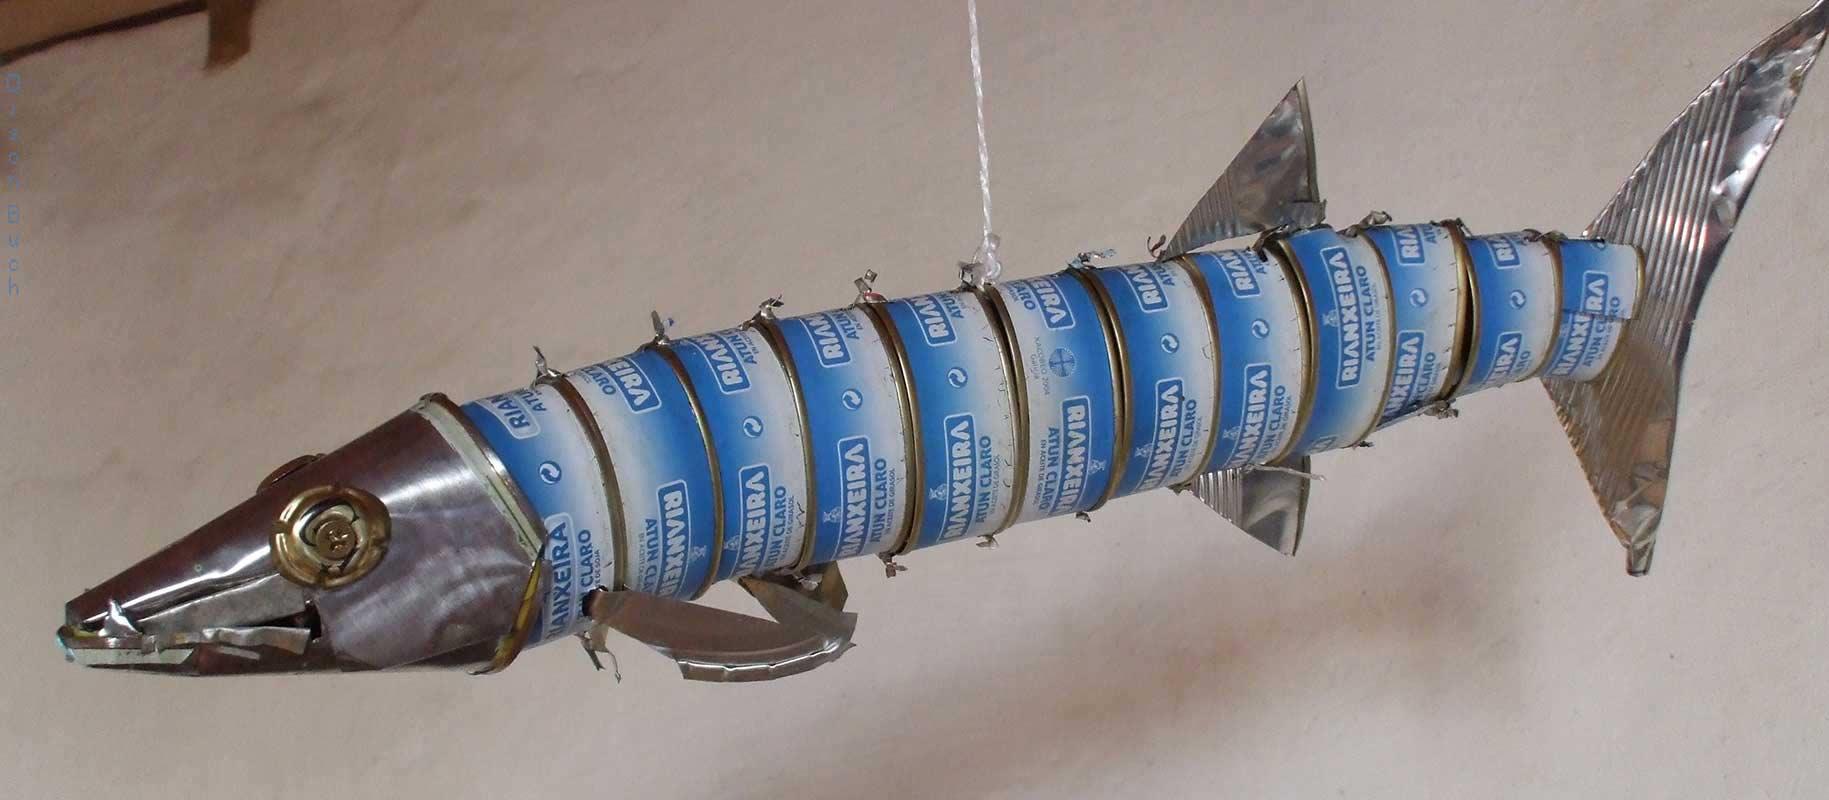 Orson Buch's tin can sculpture